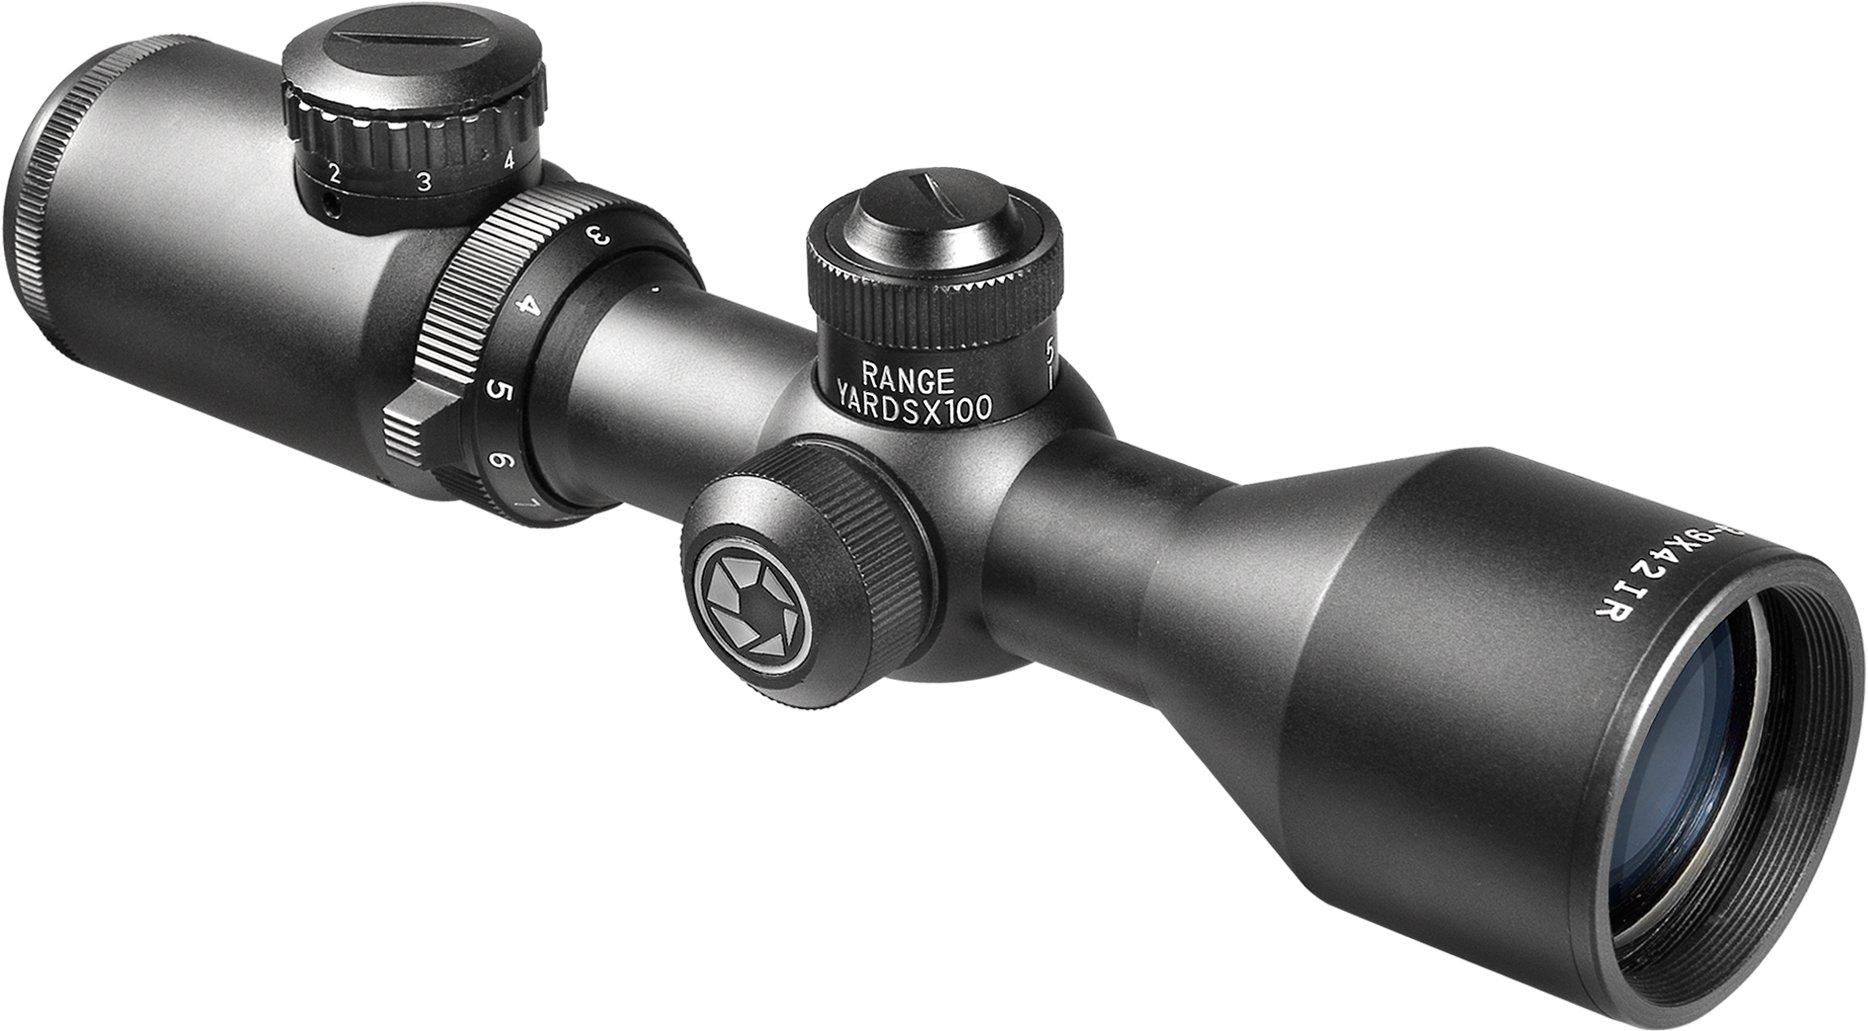 BARSKA New Rifle Scopes Quick BDC Adjustment (3-9x 42mm) by BARSKA